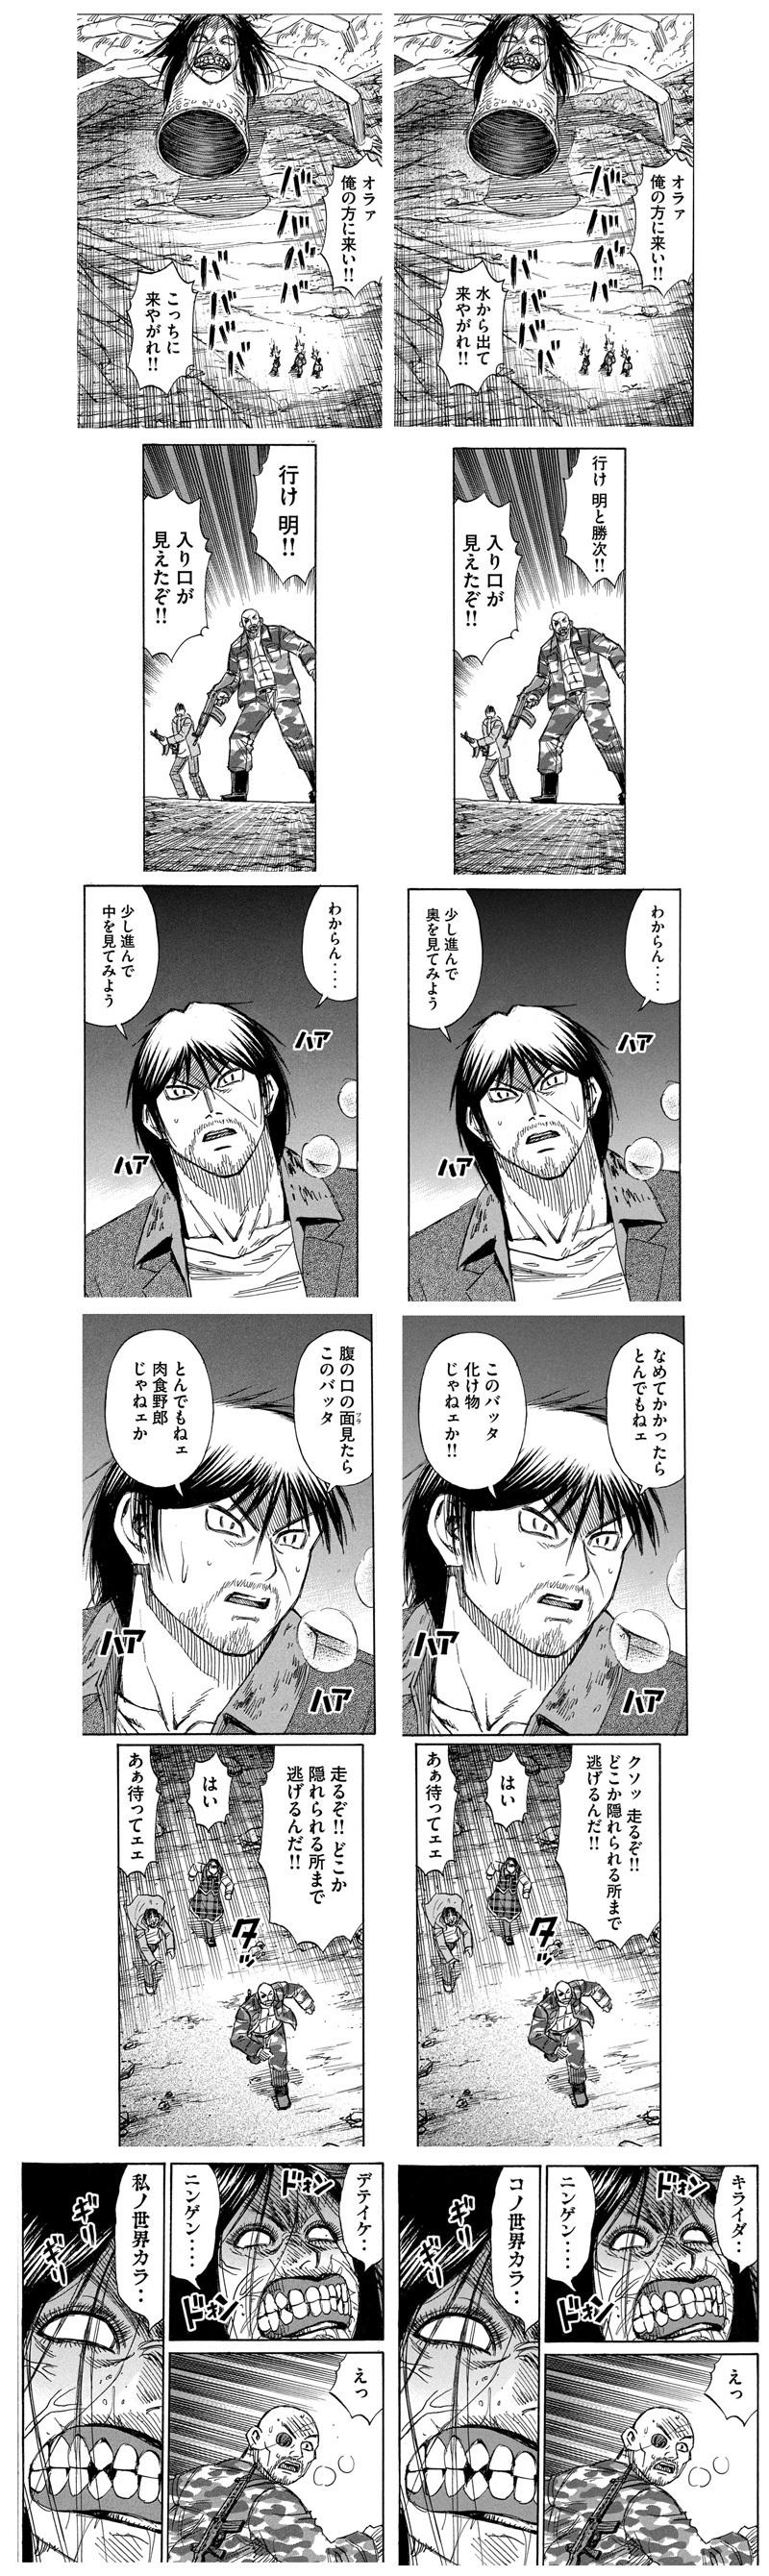 higanjima_48nichigo27-21012501.jpg